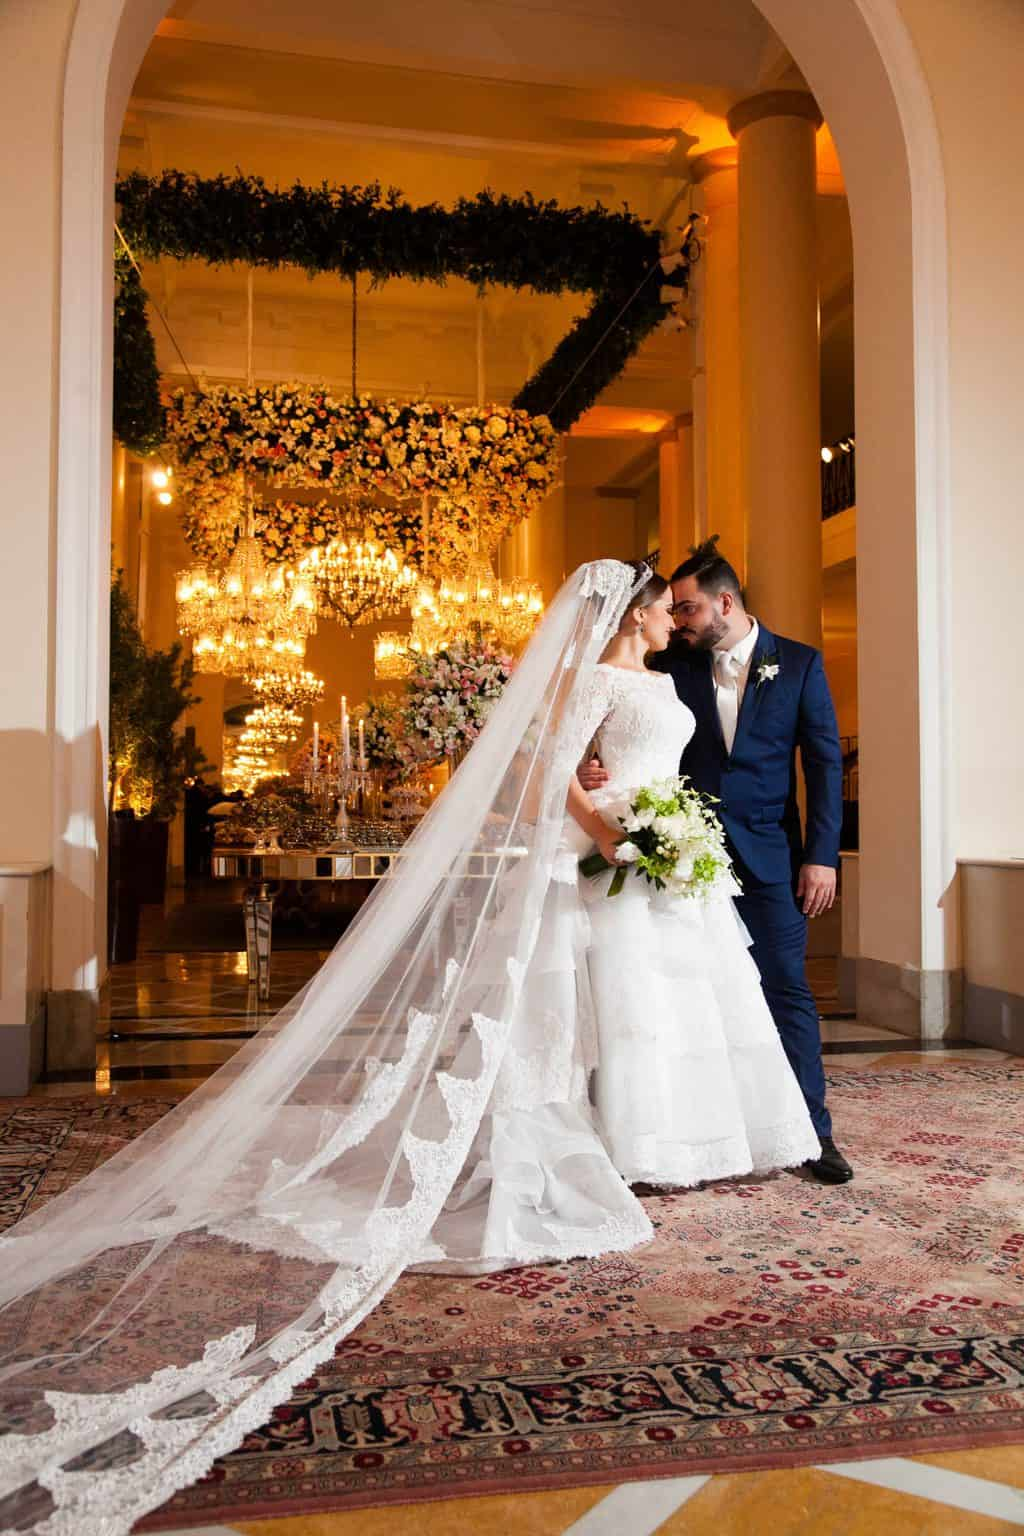 Casamento-Clássico-Casamento-tradicional-Copacabana-Palace-Monica-Roias-Poses-Casal-Ribas-Foto-e-Vídeo-Tuanny-e-Bernardo-CaseMe